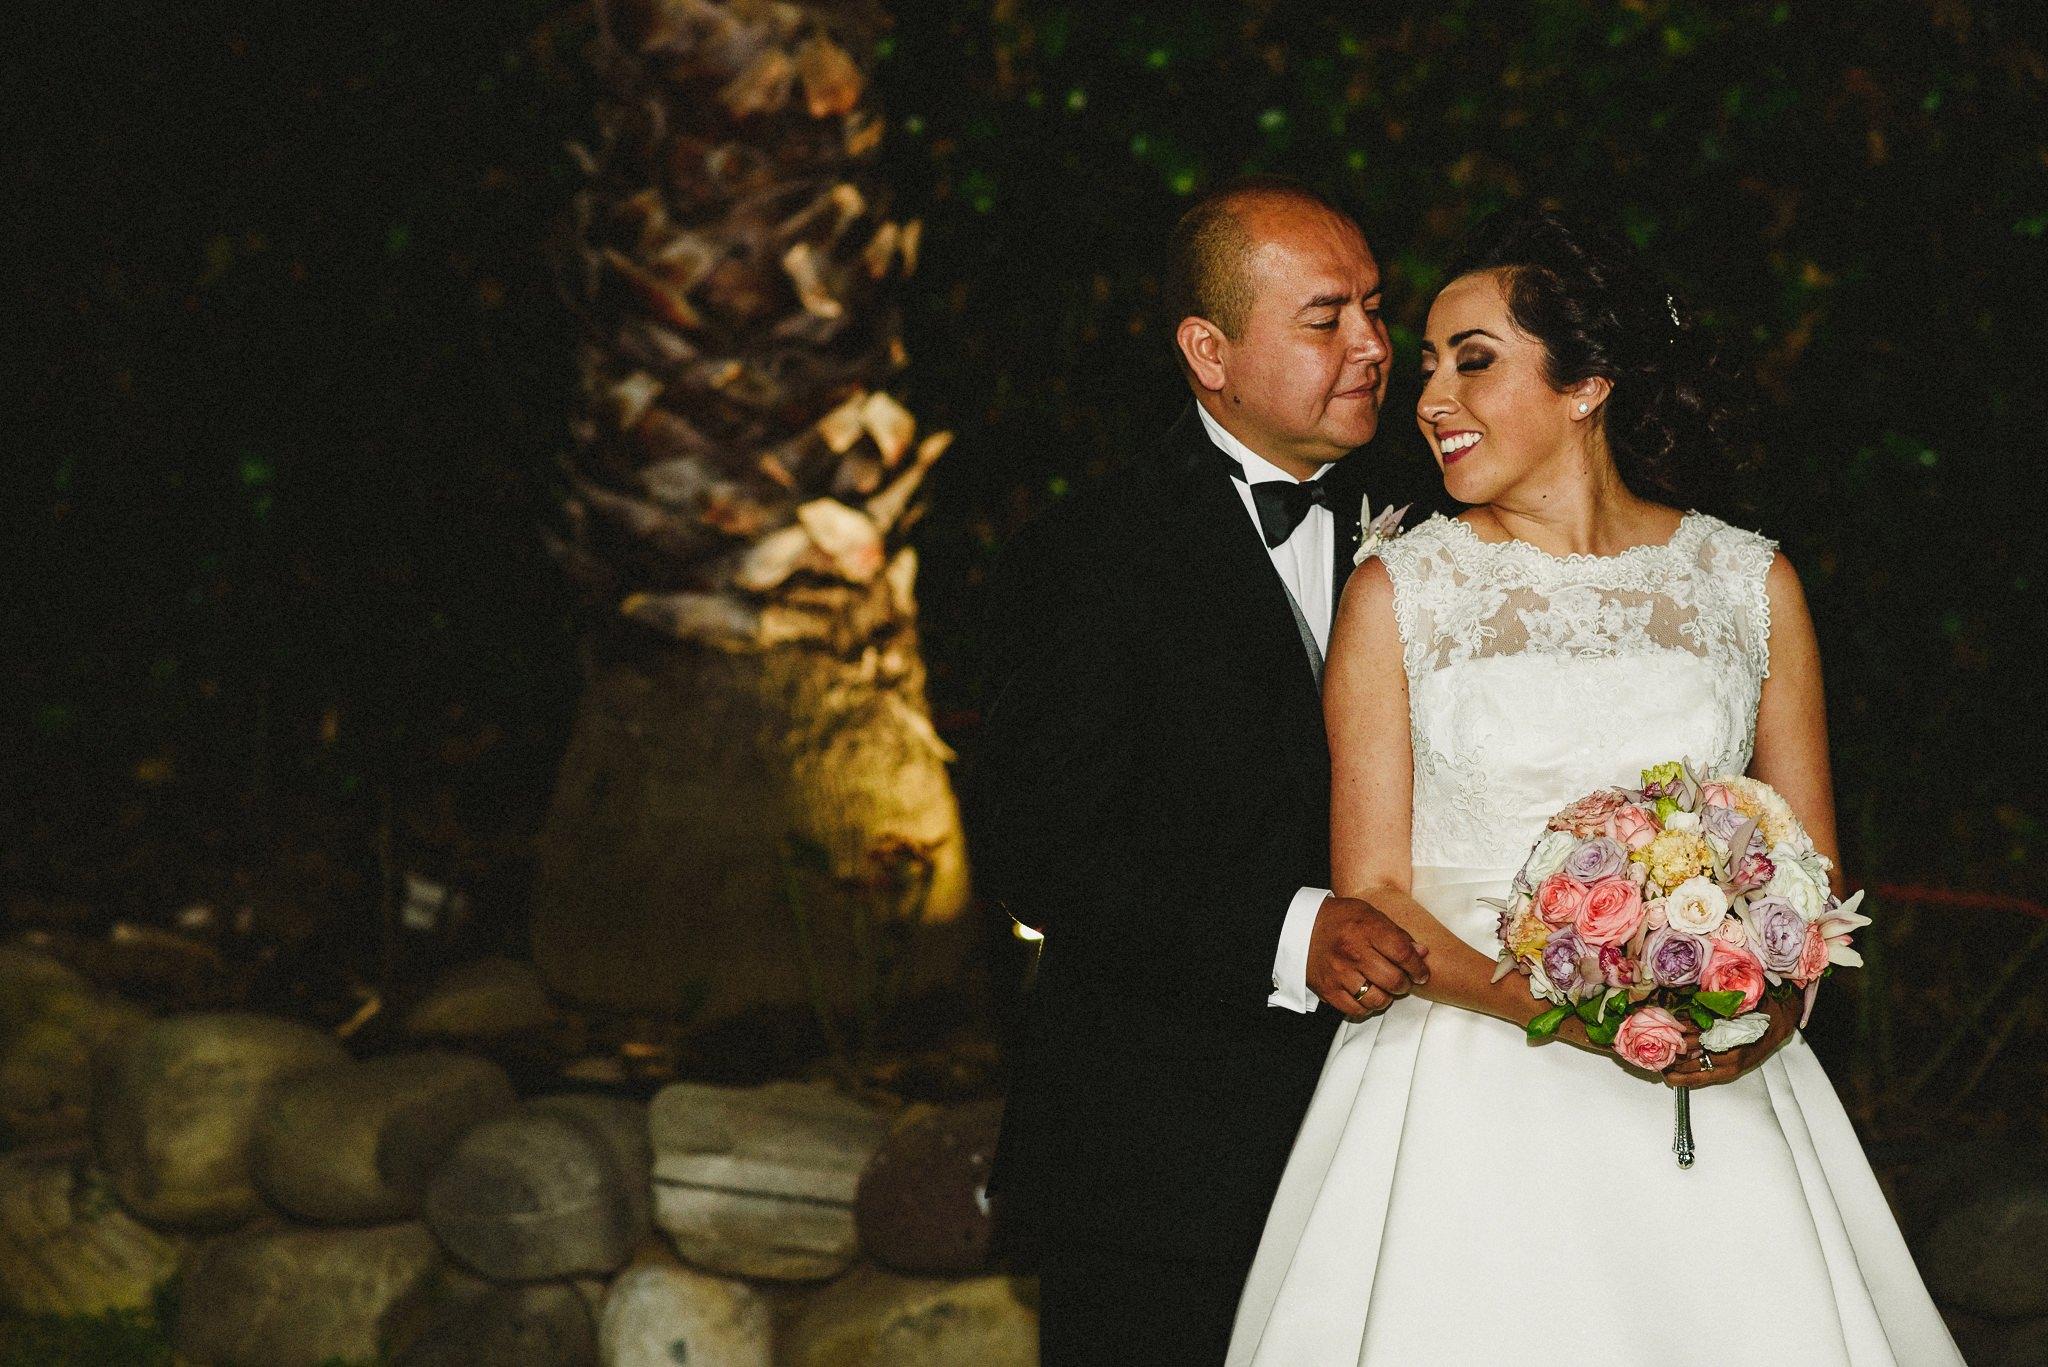 Wedding-Boda-Tulancingo-Hidalgo-Salon-Essenzia-Luis-Houdin-45-film